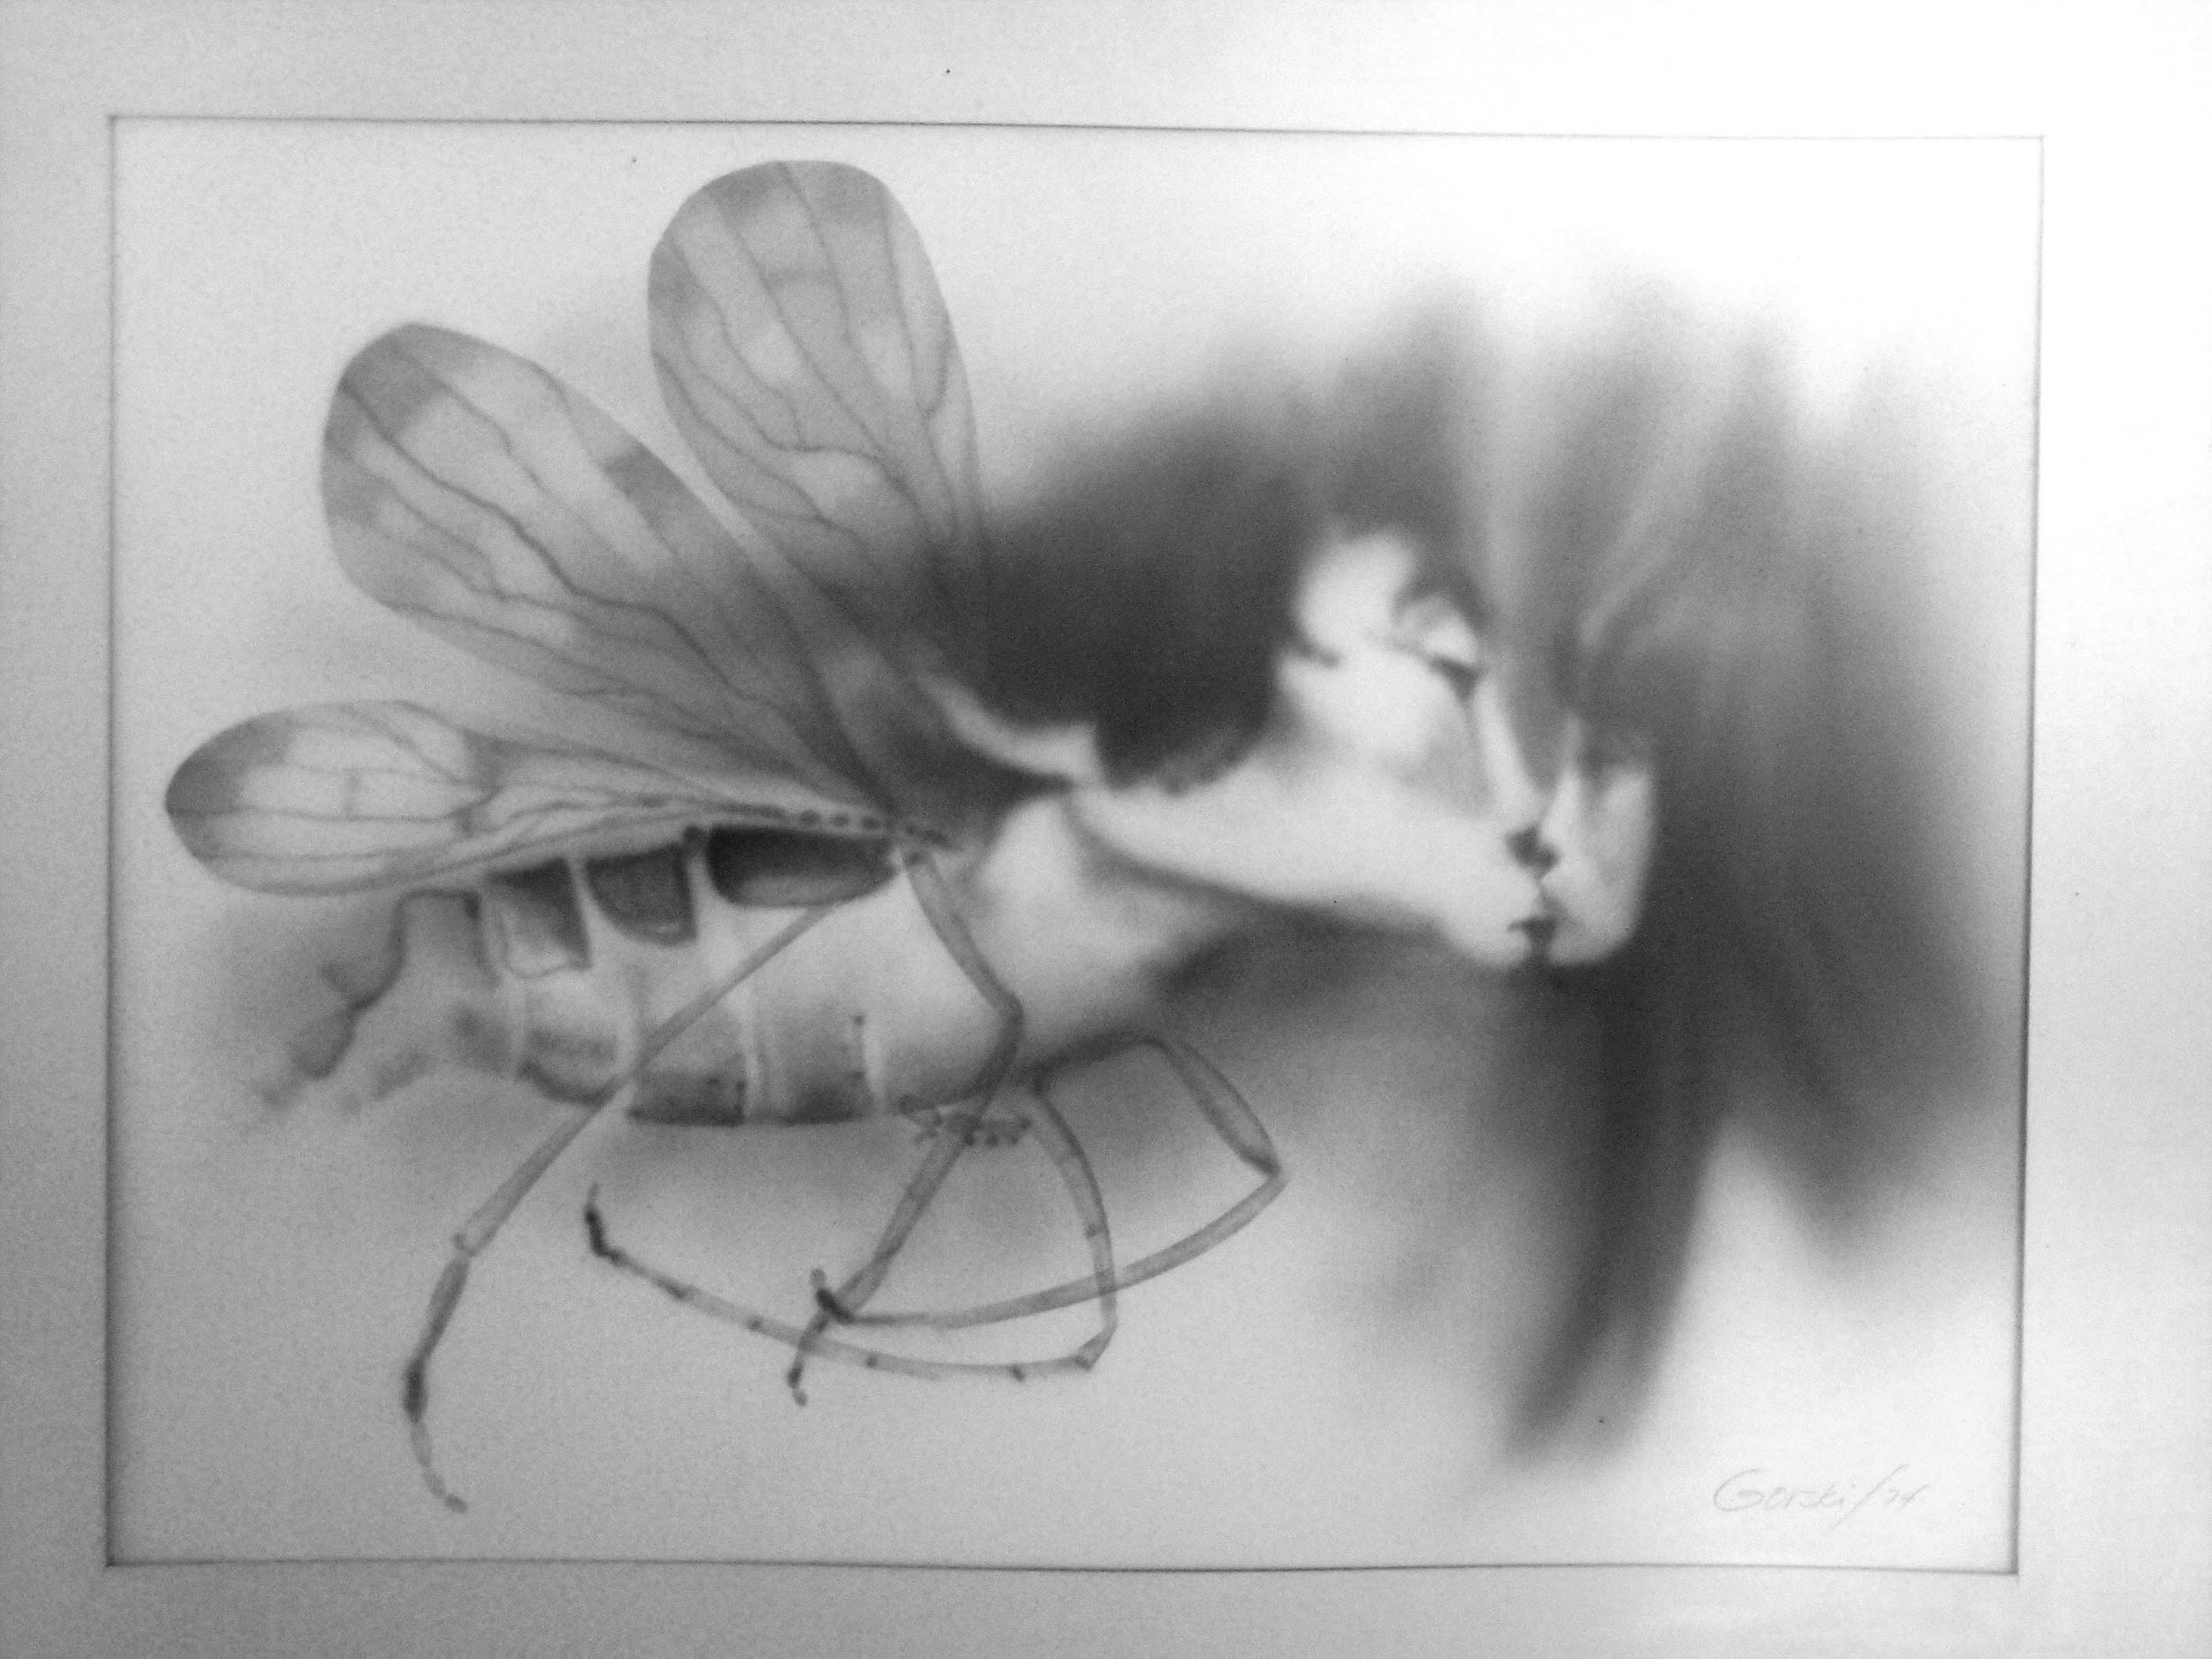 Lovebugs_2.jpg